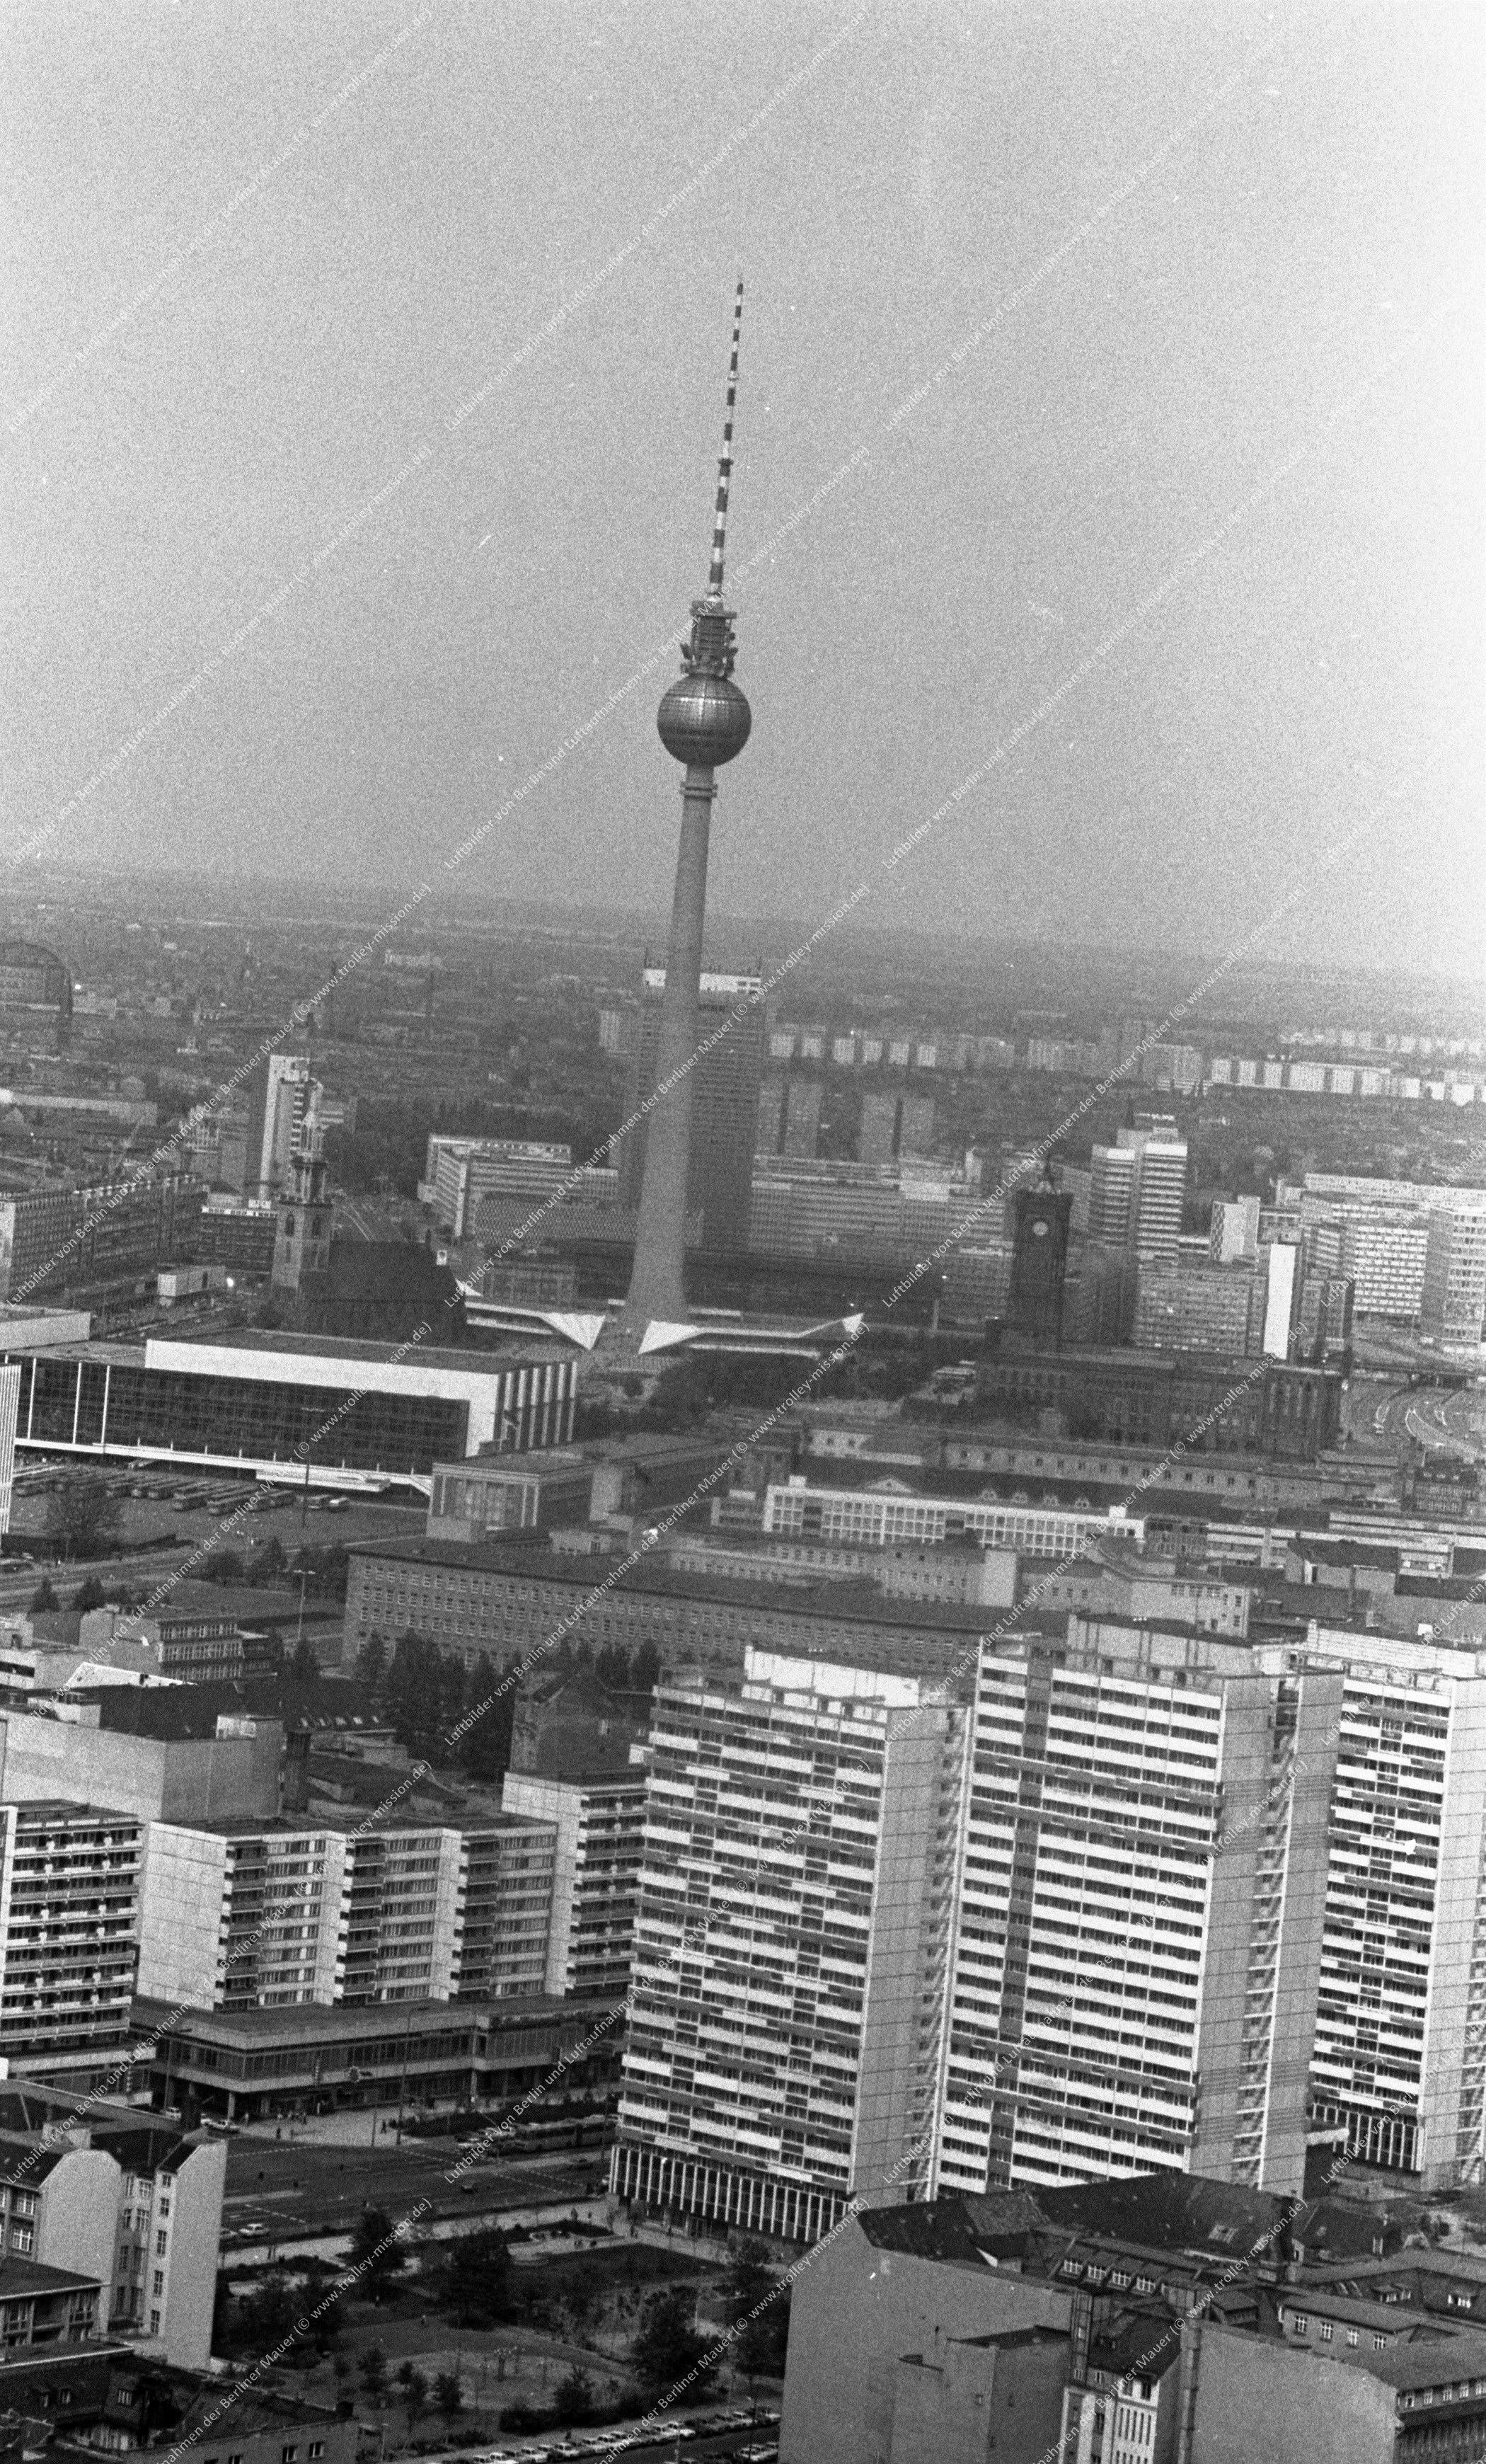 Berlin Luftbild Fernsehturm in Ost-Berlin vom 12. Mai 1982 (Bild 091)